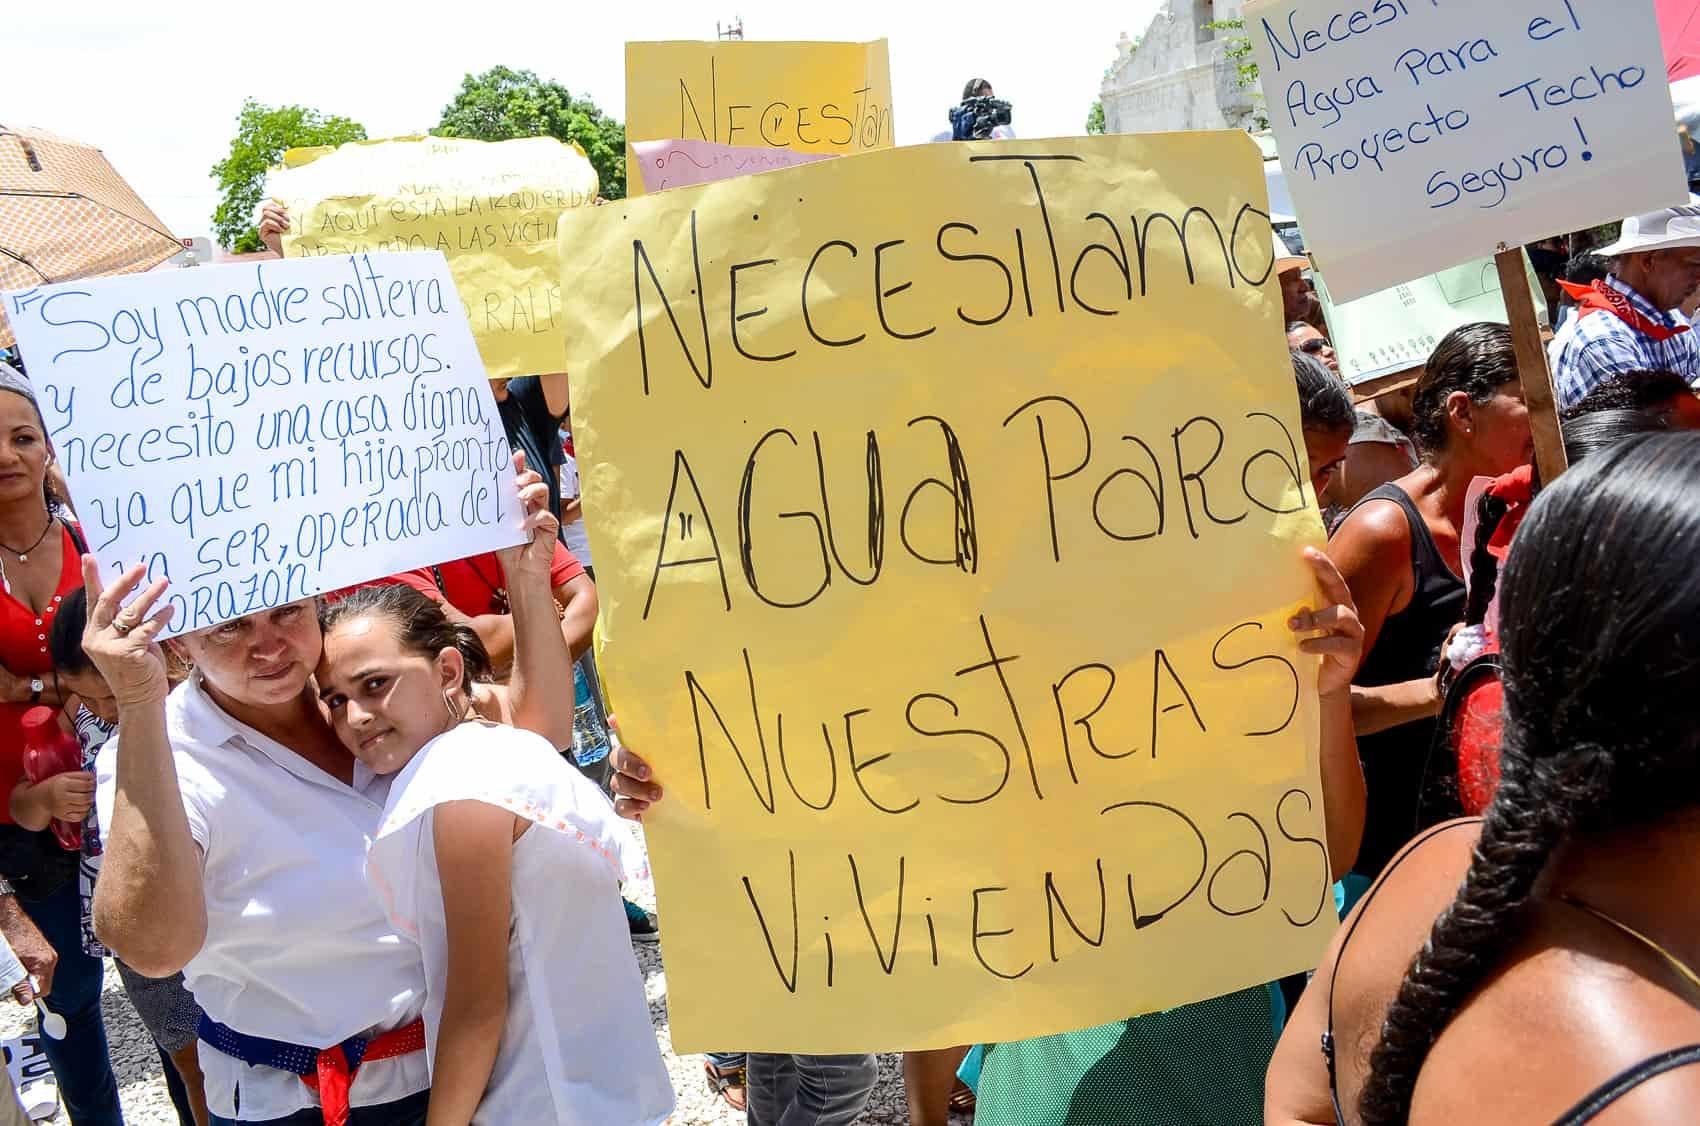 Nicoya protesters